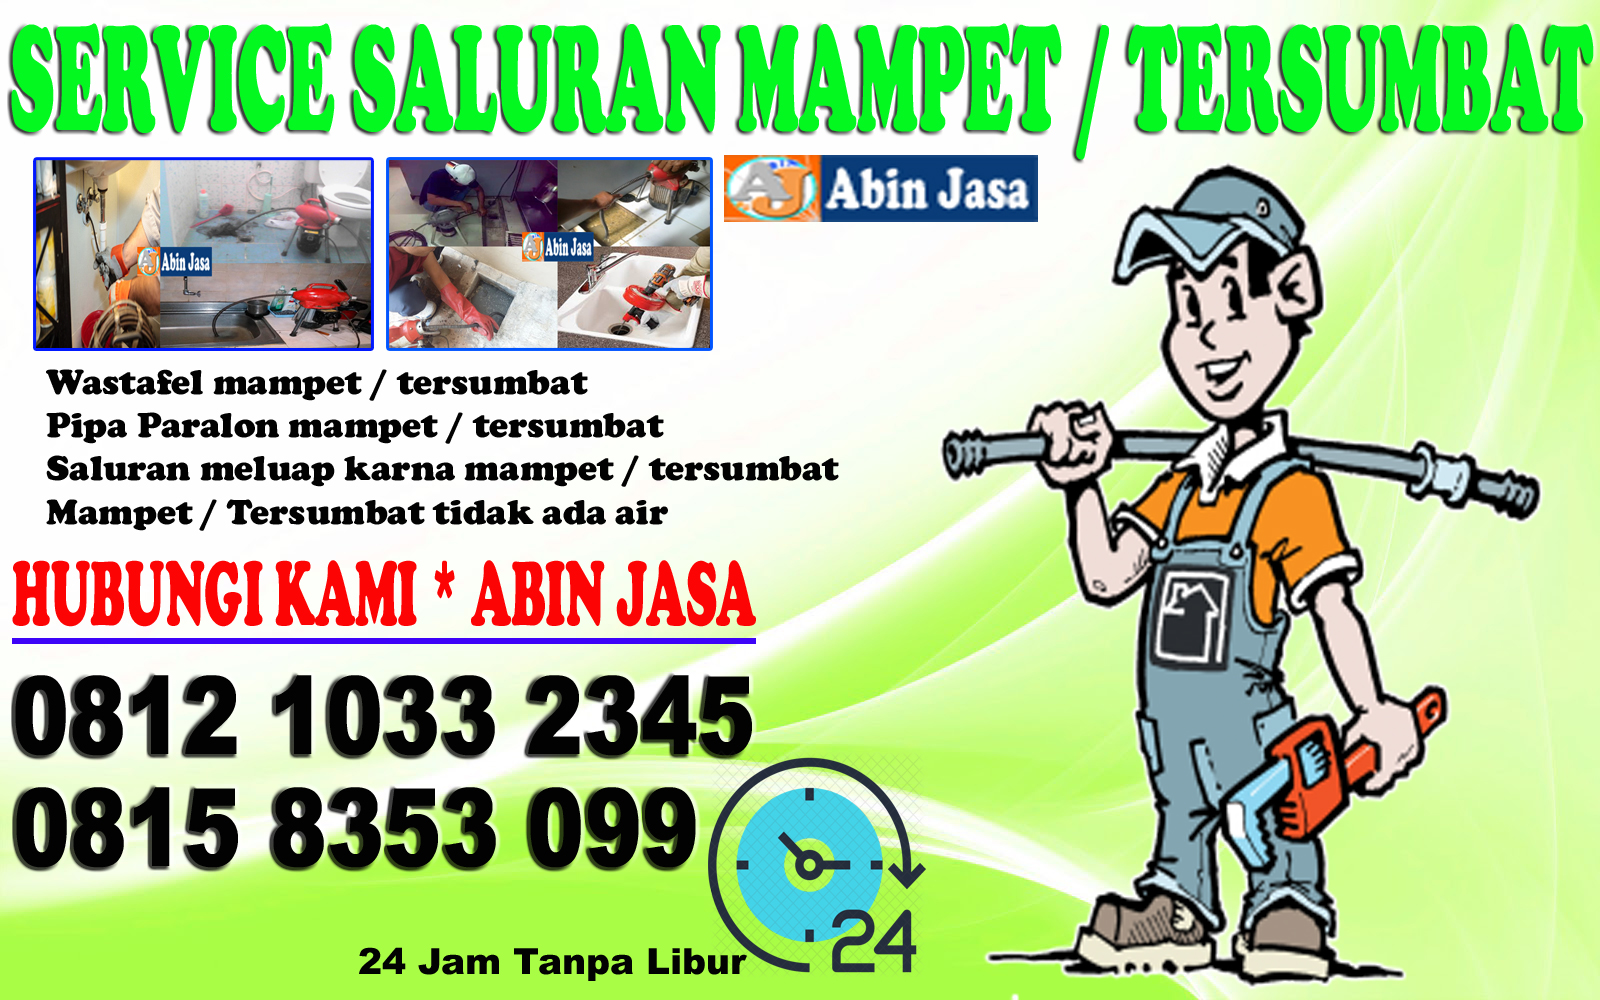 Tukang Ledeng kebayoran baru, Jasa Pelancar Saluran Mampet 08158353099